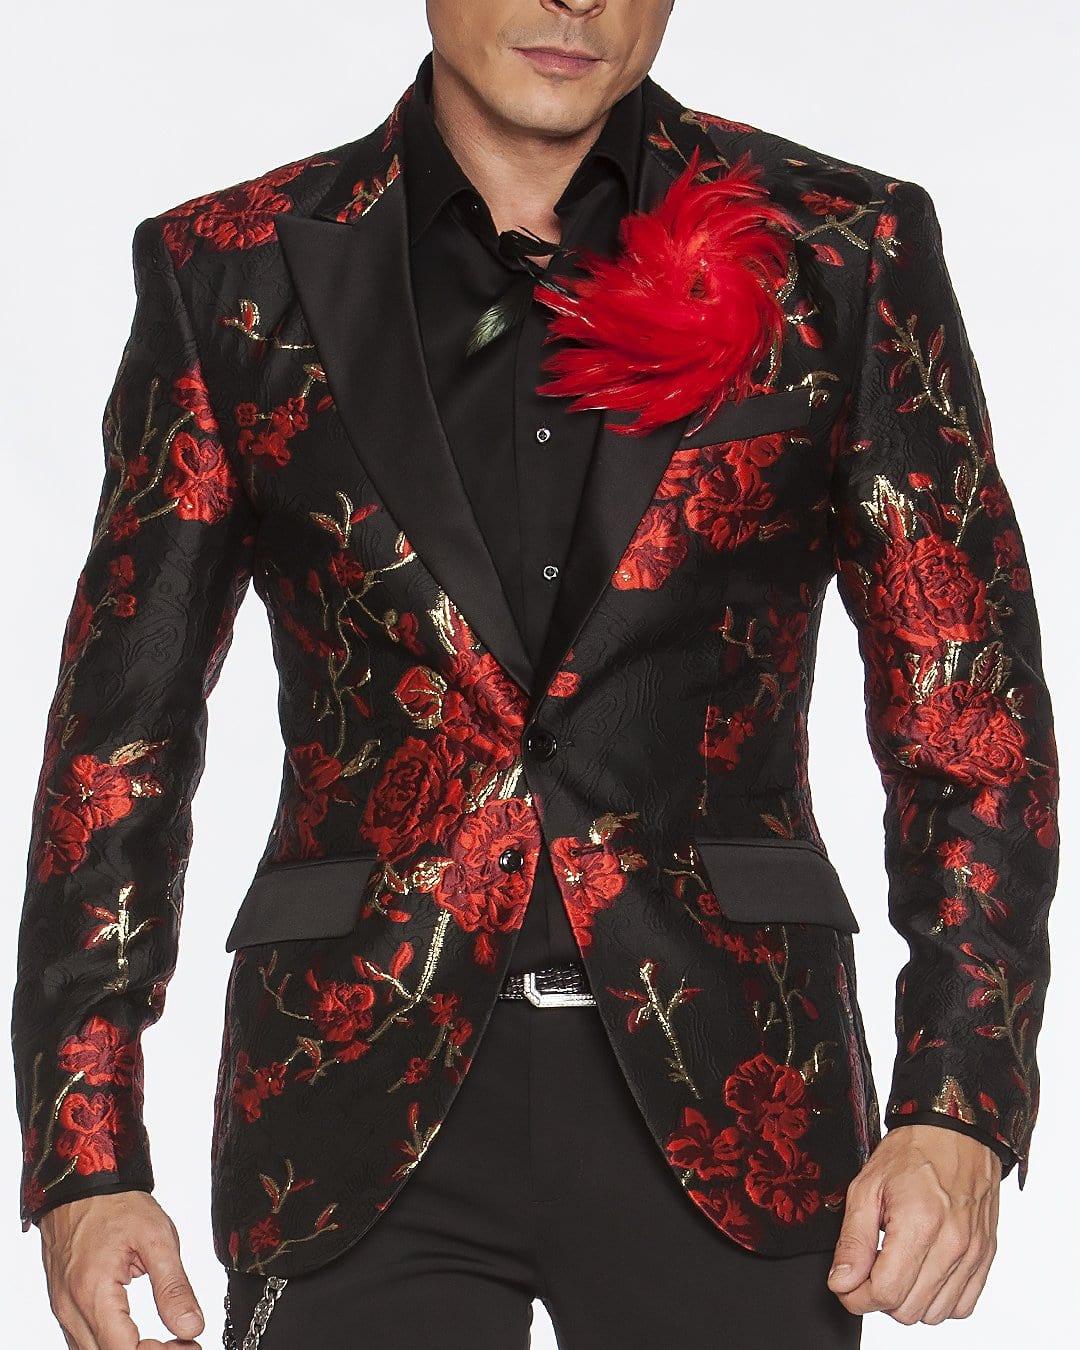 S-5xl Male Ds In Love Season Royal Blazer Mens Brand Stage Singer Suit Costumes Clothing Suit Coat Plus Size Formal Dress Suits & Blazers Men's Clothing